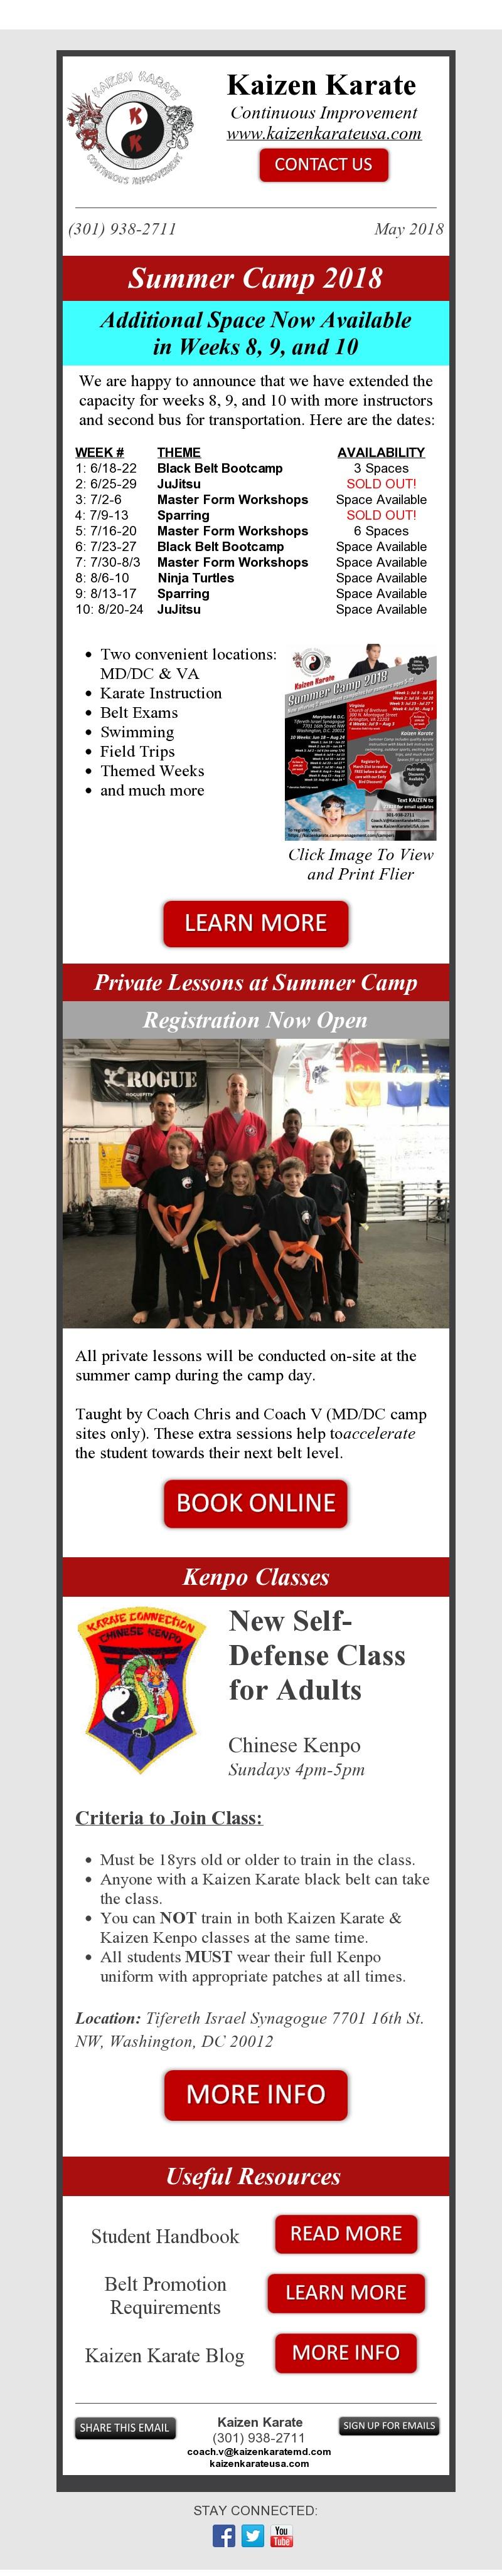 May 2018 - Kaizen Karate Newsletter .jpg